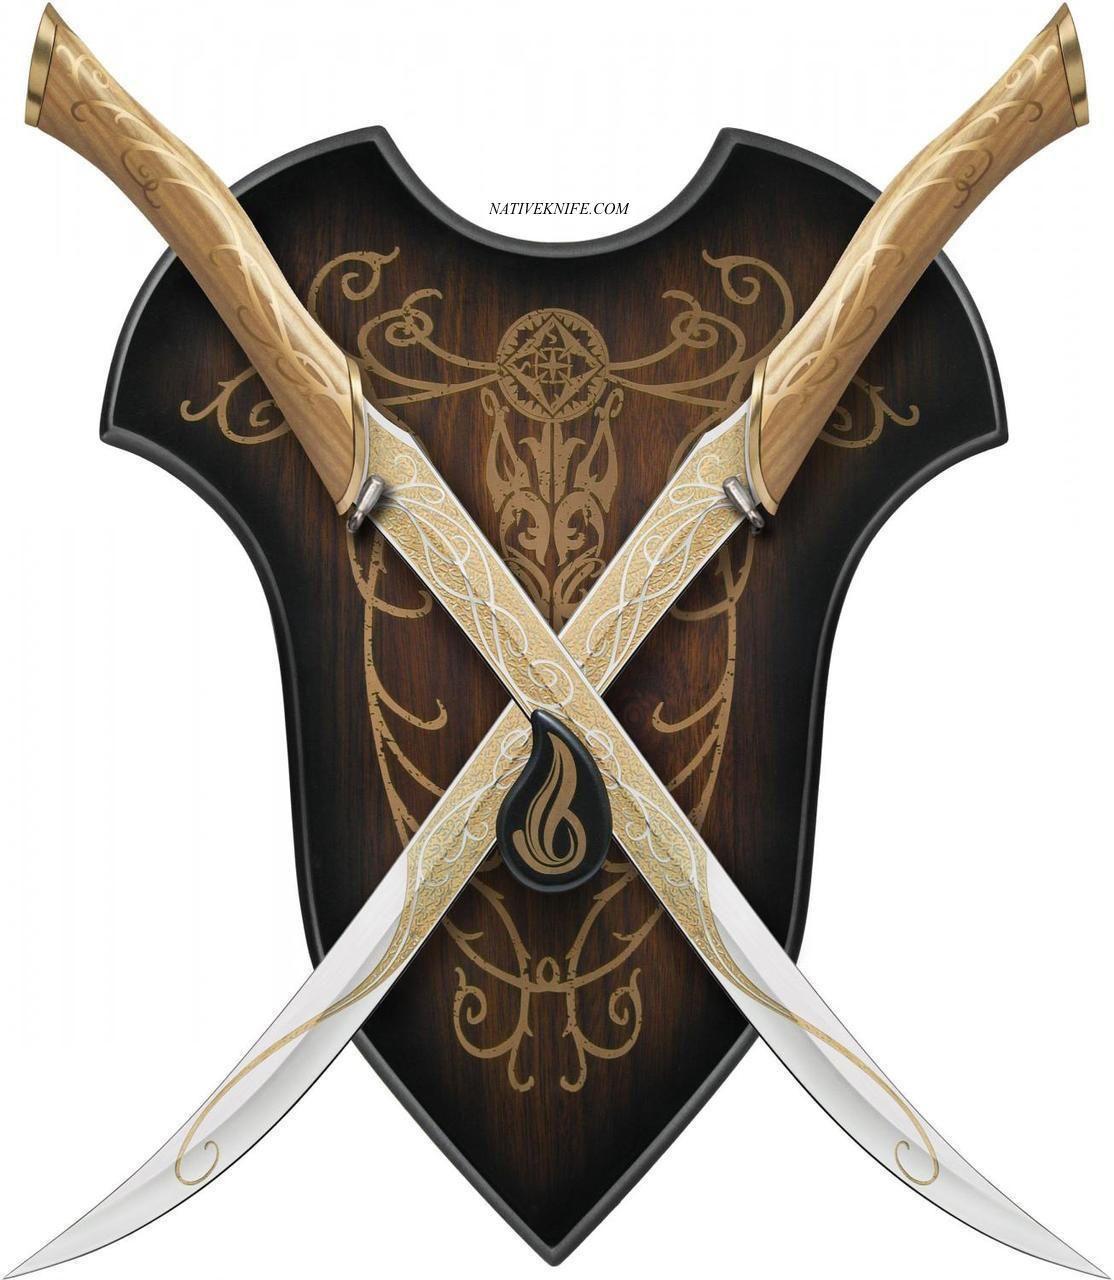 Pin by Jason Lankton on Ink | Sword, Legolas, The hobbit